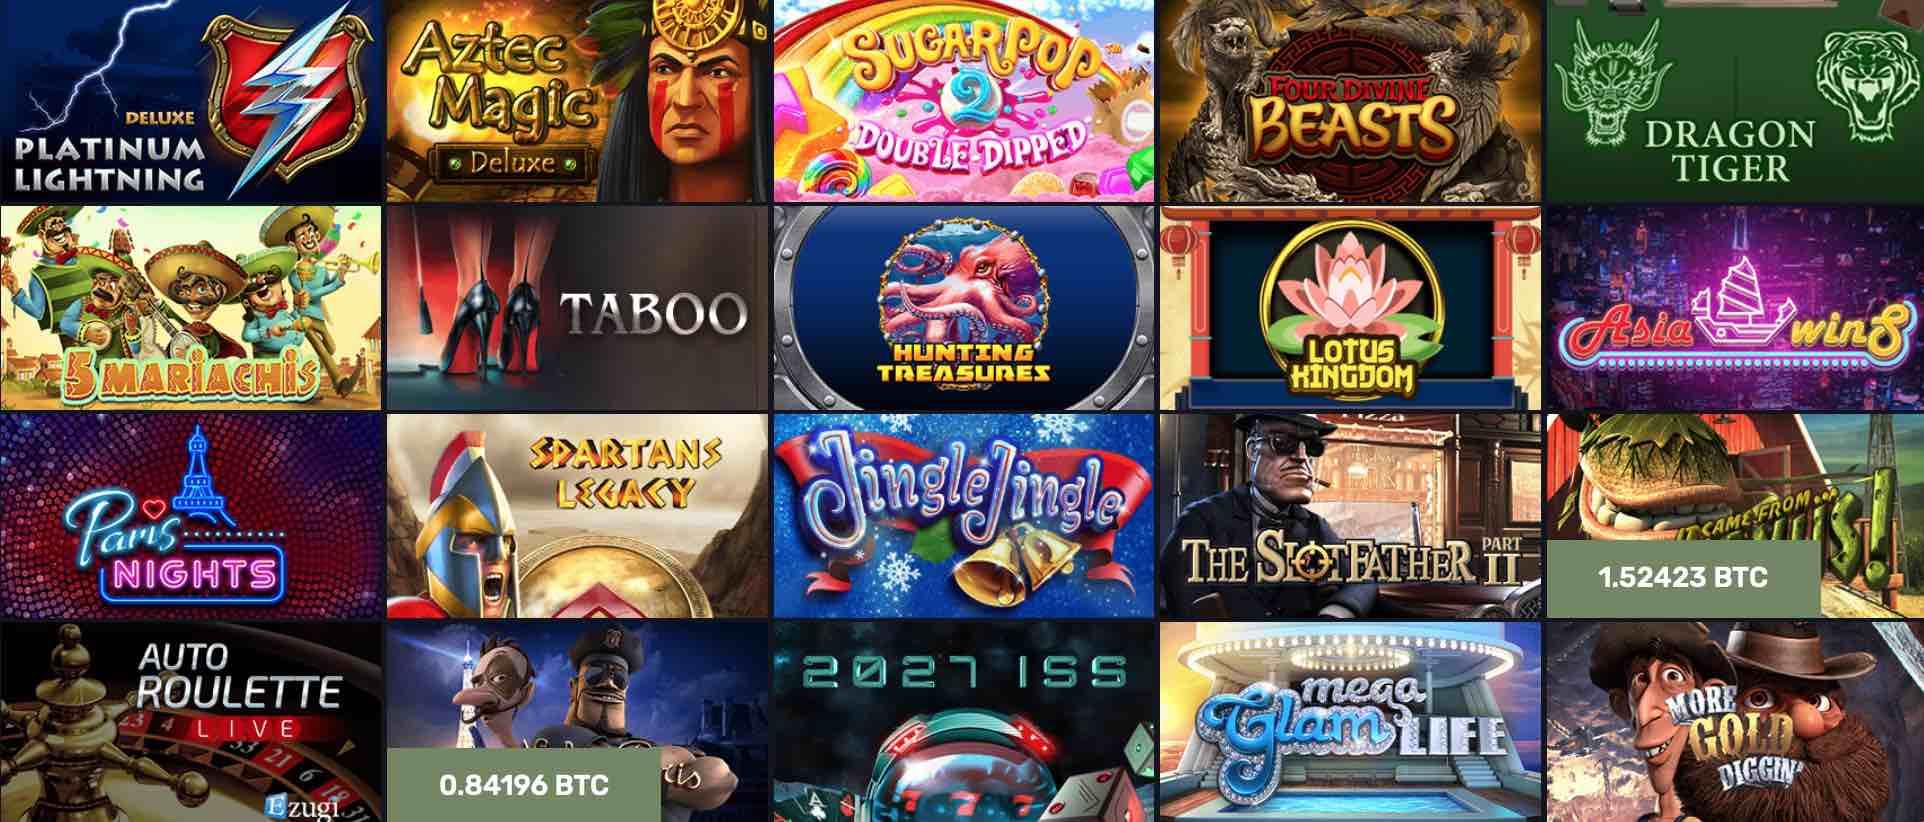 Coin bitcoin casino genting